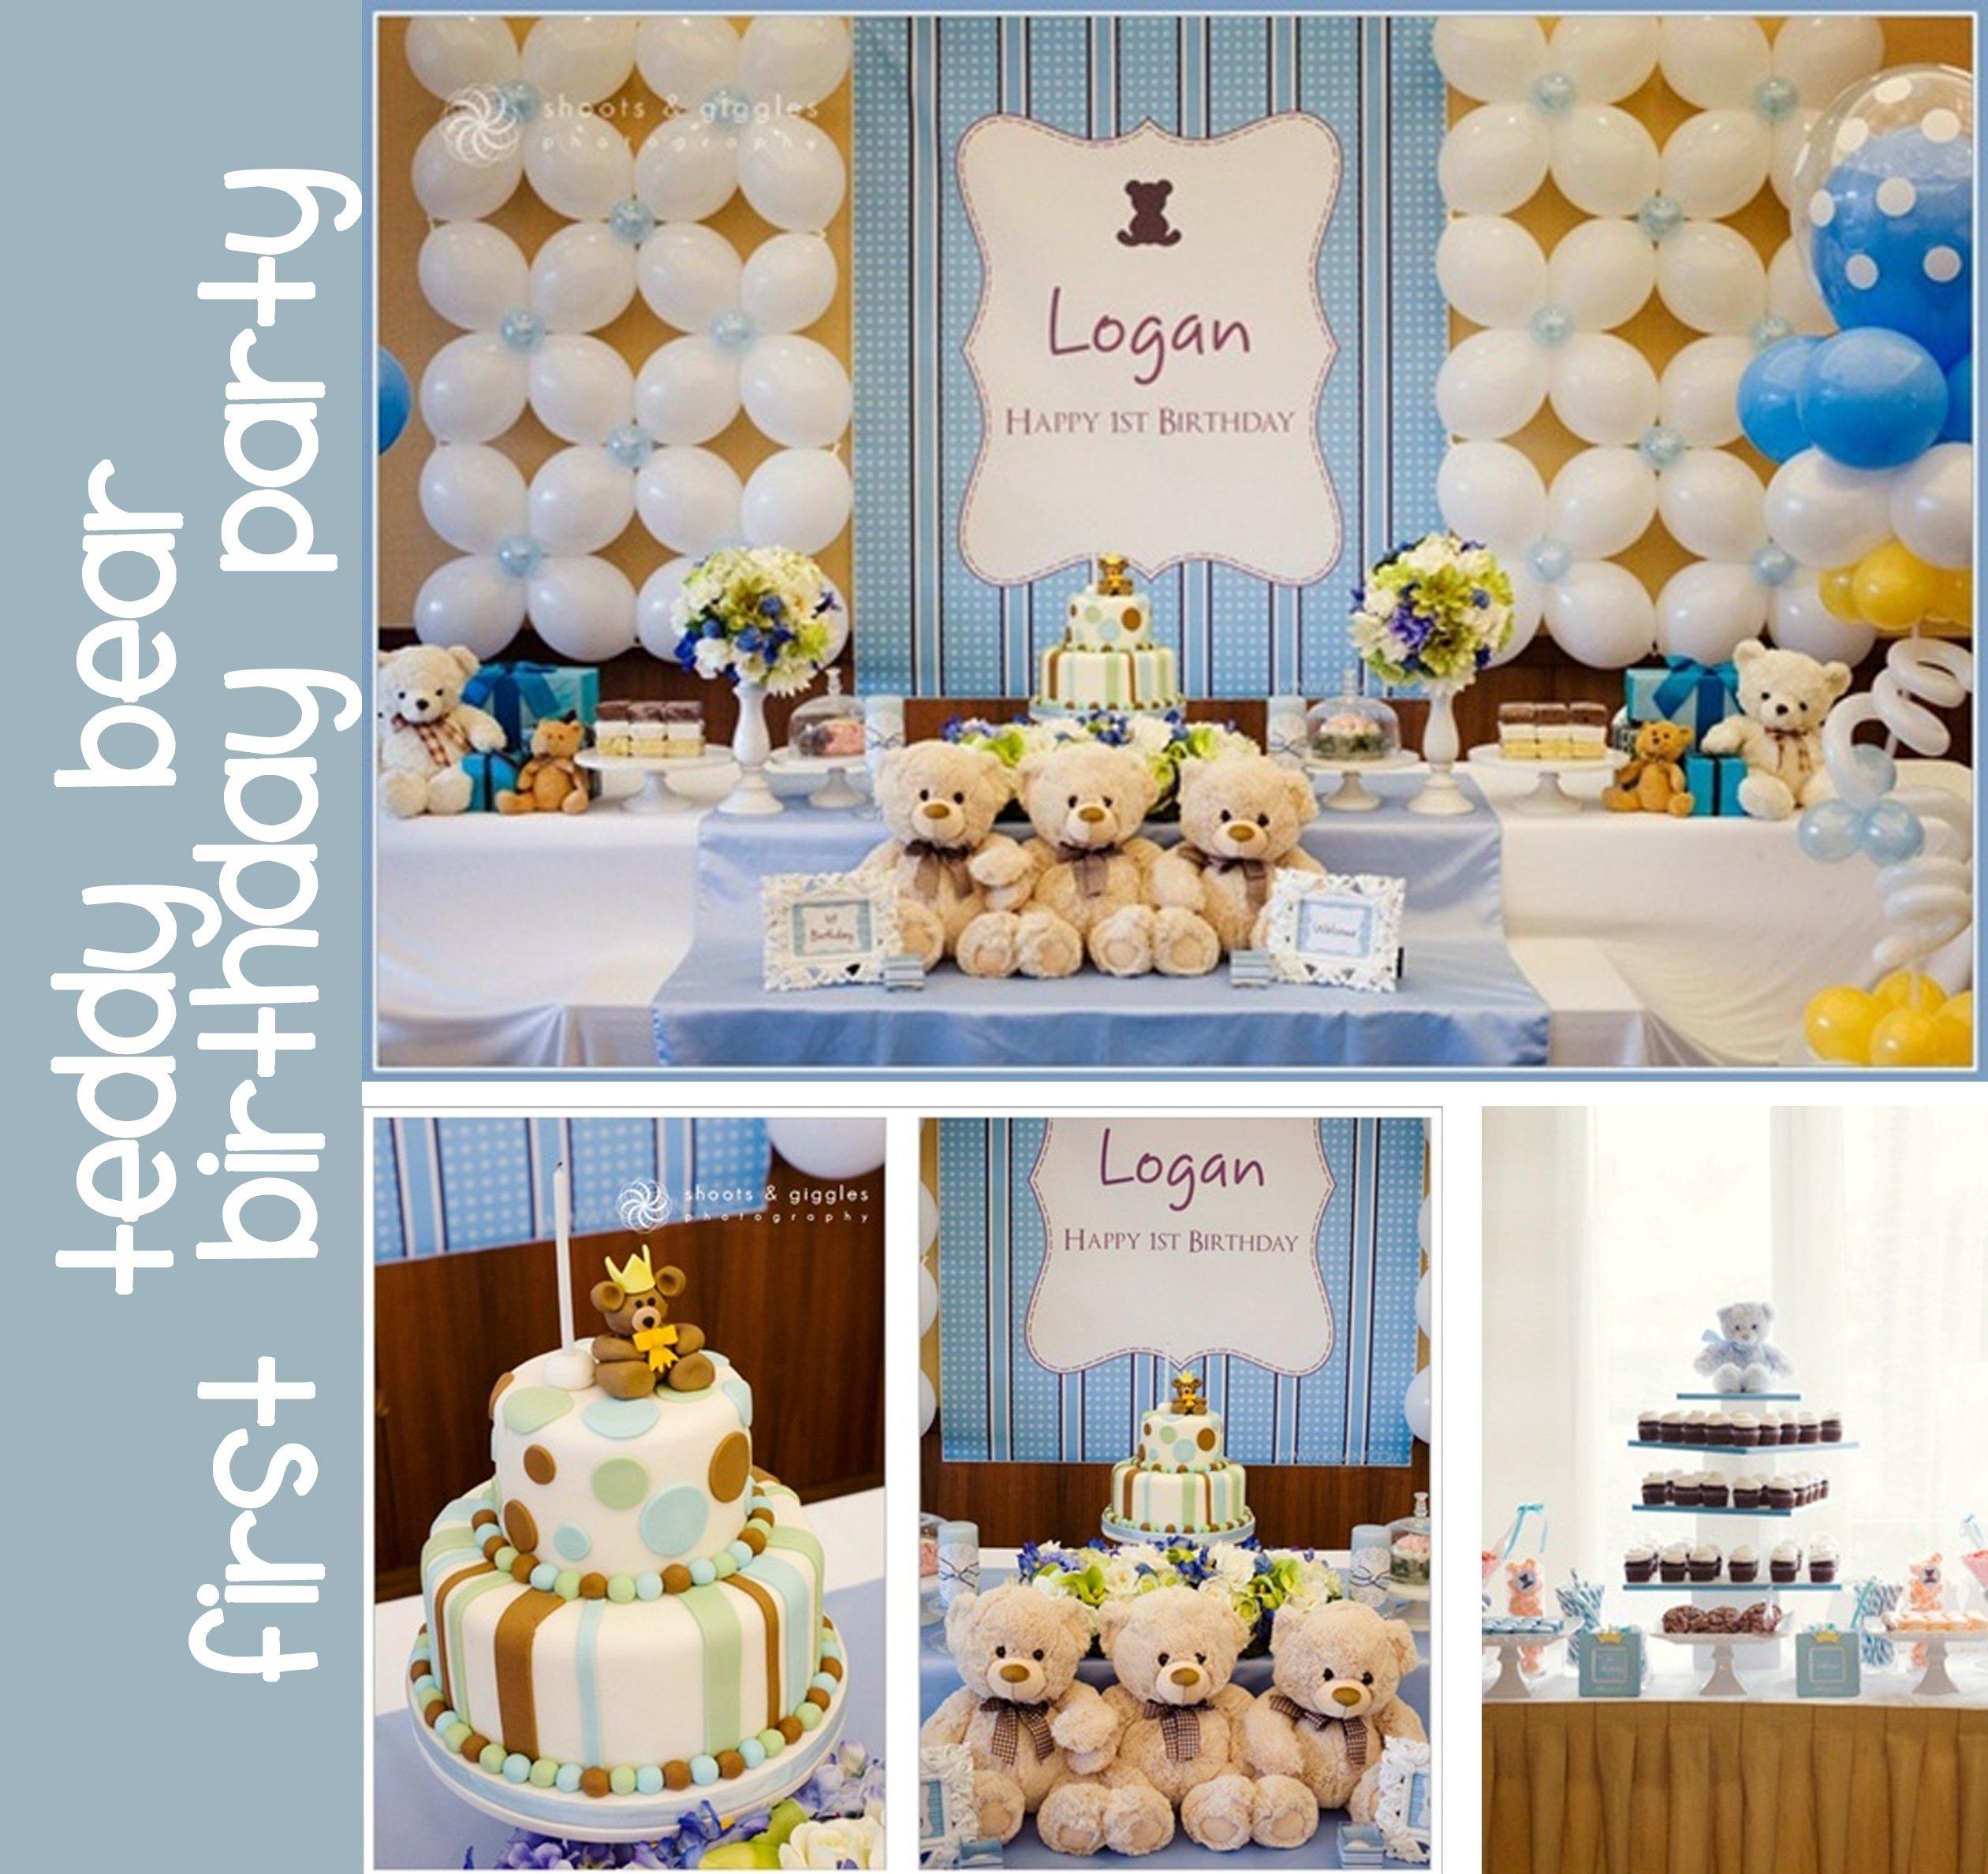 10 Most Popular Cheap 1St Birthday Party Ideas baby first birthday ideas for boy first birthday teddy bear theme 27 2020